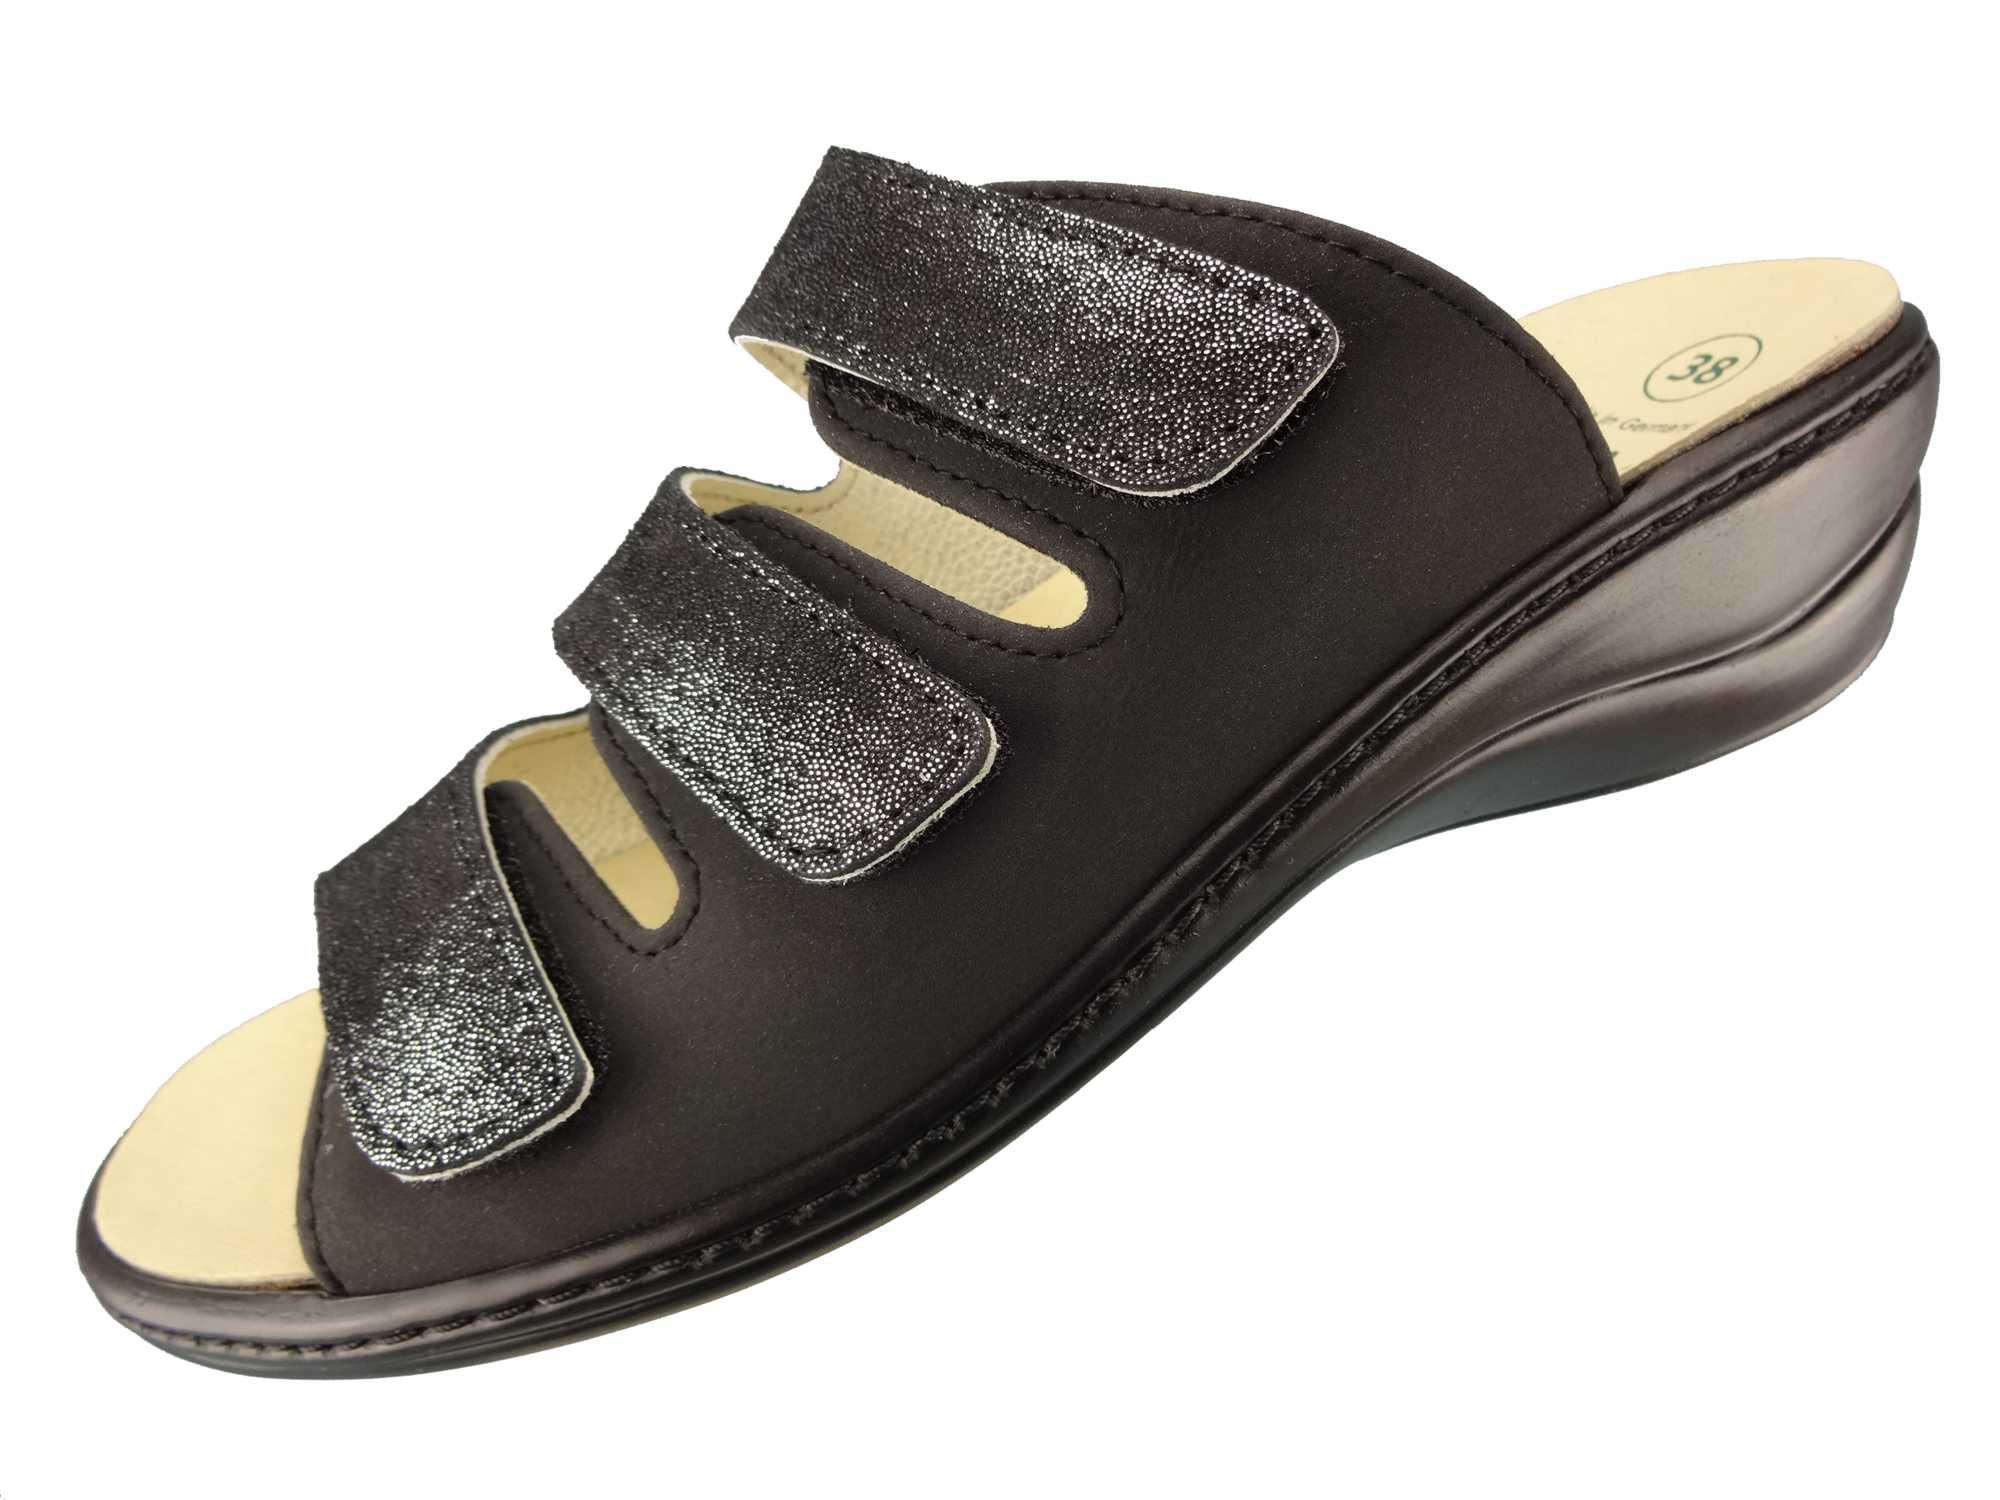 "Algemare Damen Leder Pantolette ""Nubuk Glitter"" Keilpantolette mit Algen-Kork Wechselfußbett Made in Germany 1239_0406"